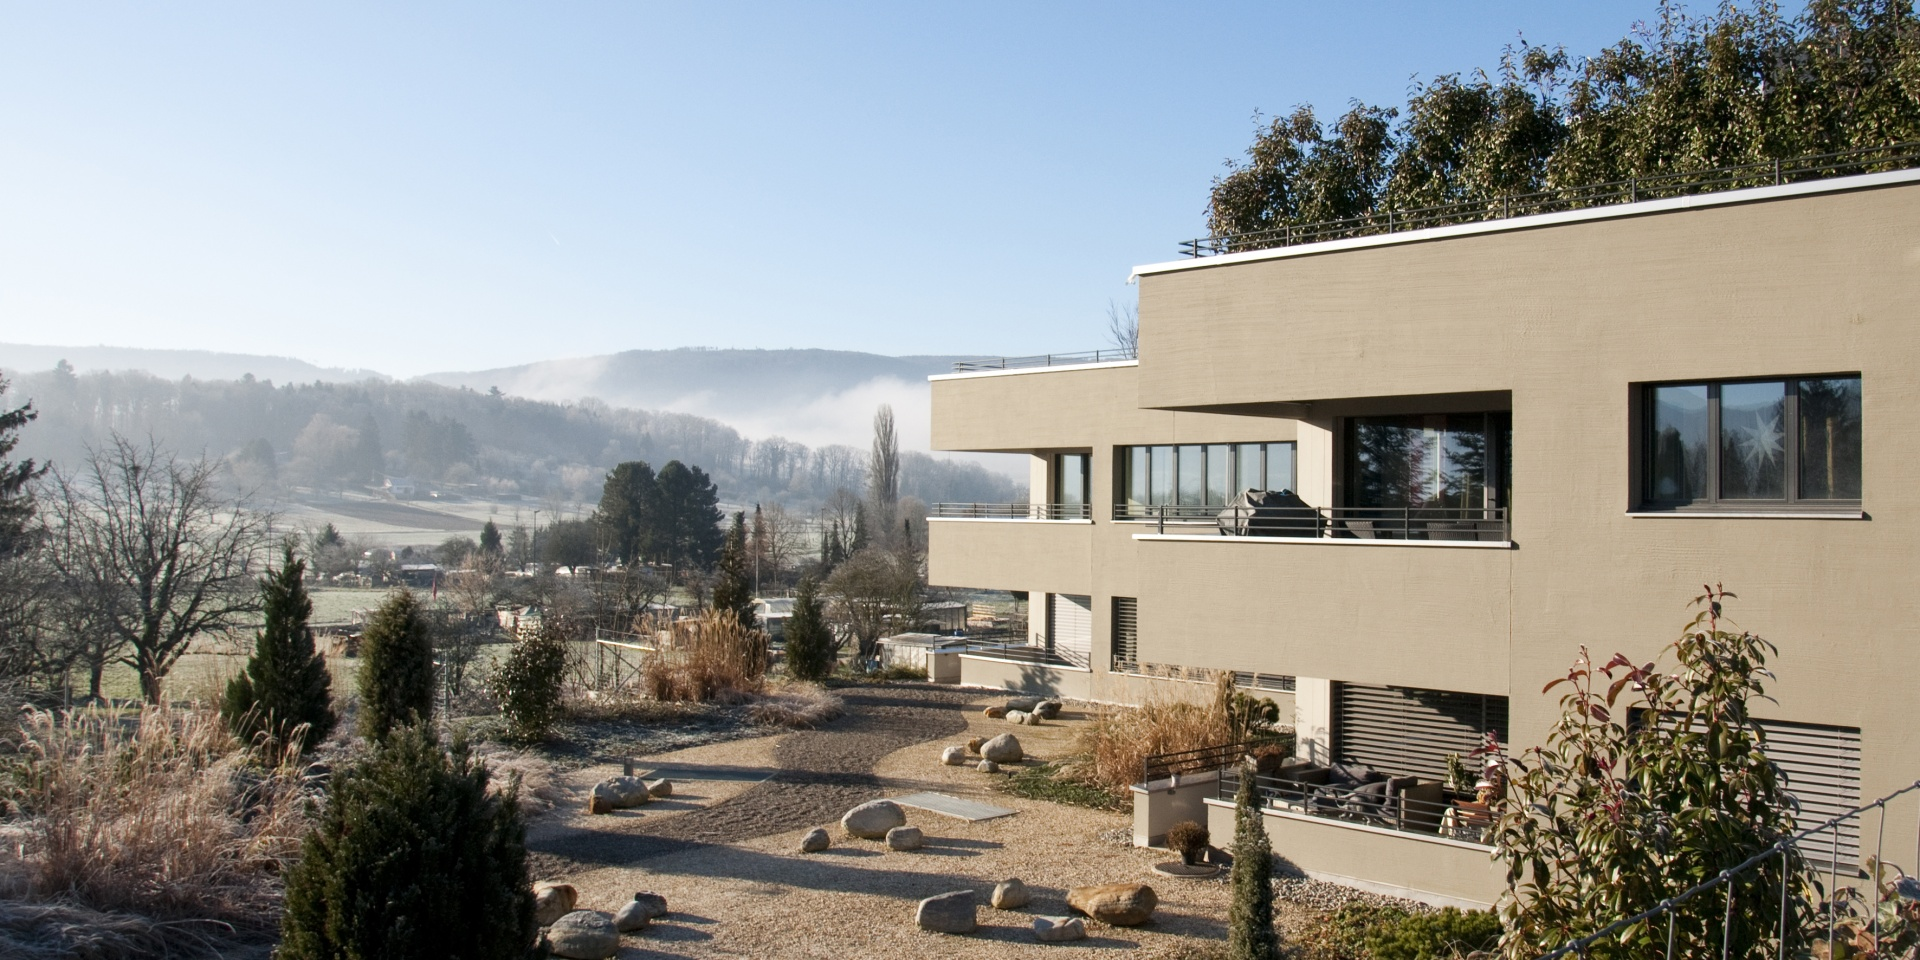 Rebberg_Gartengestaltung  © Architektur Rolf Stalder AG